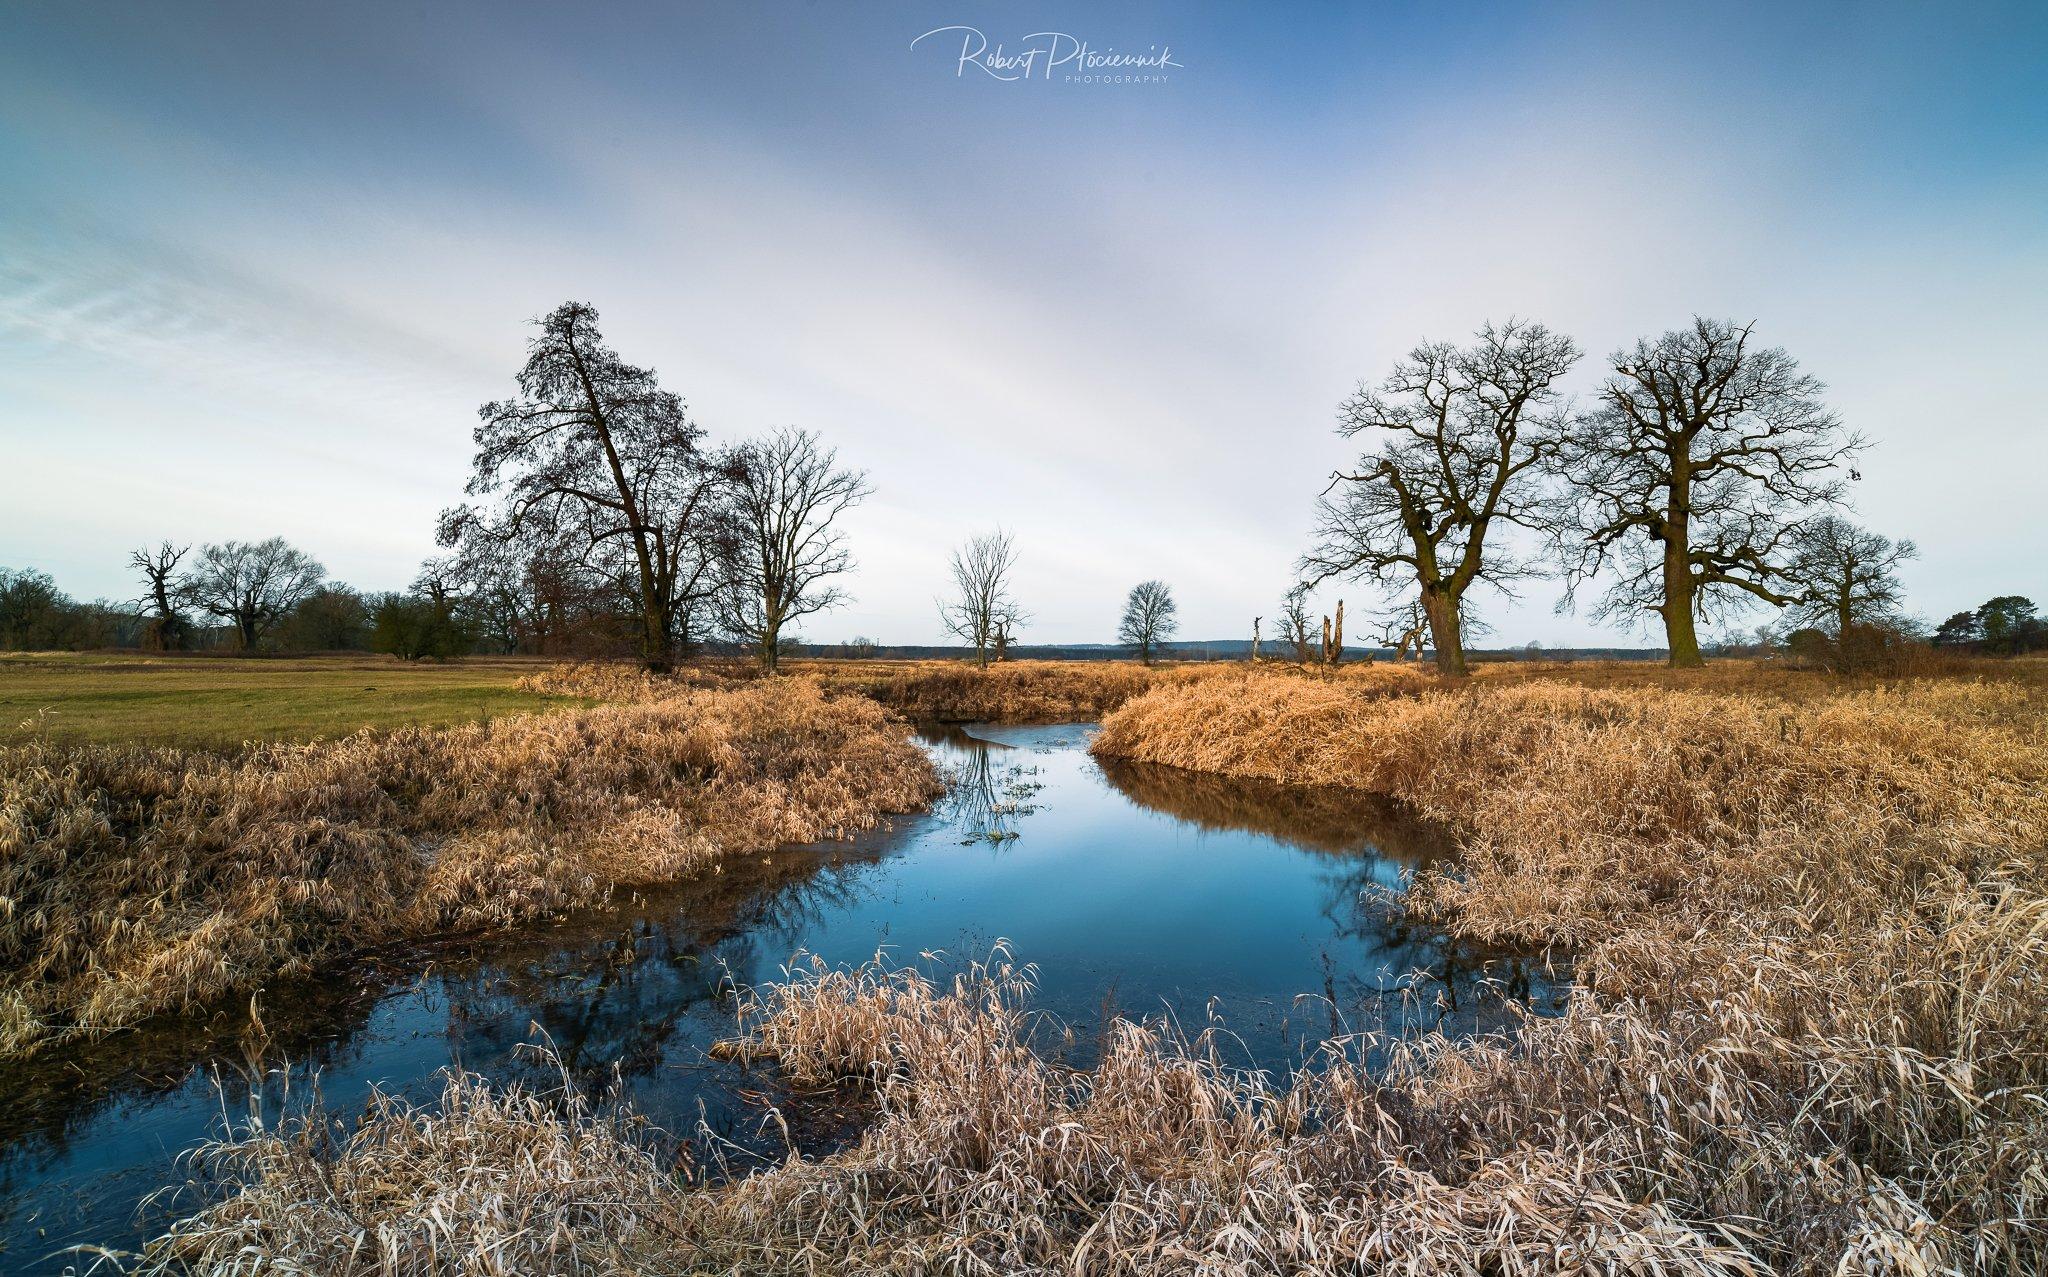 landscape, trees, morning, sky, clouds, nature, Płóciennik Robert